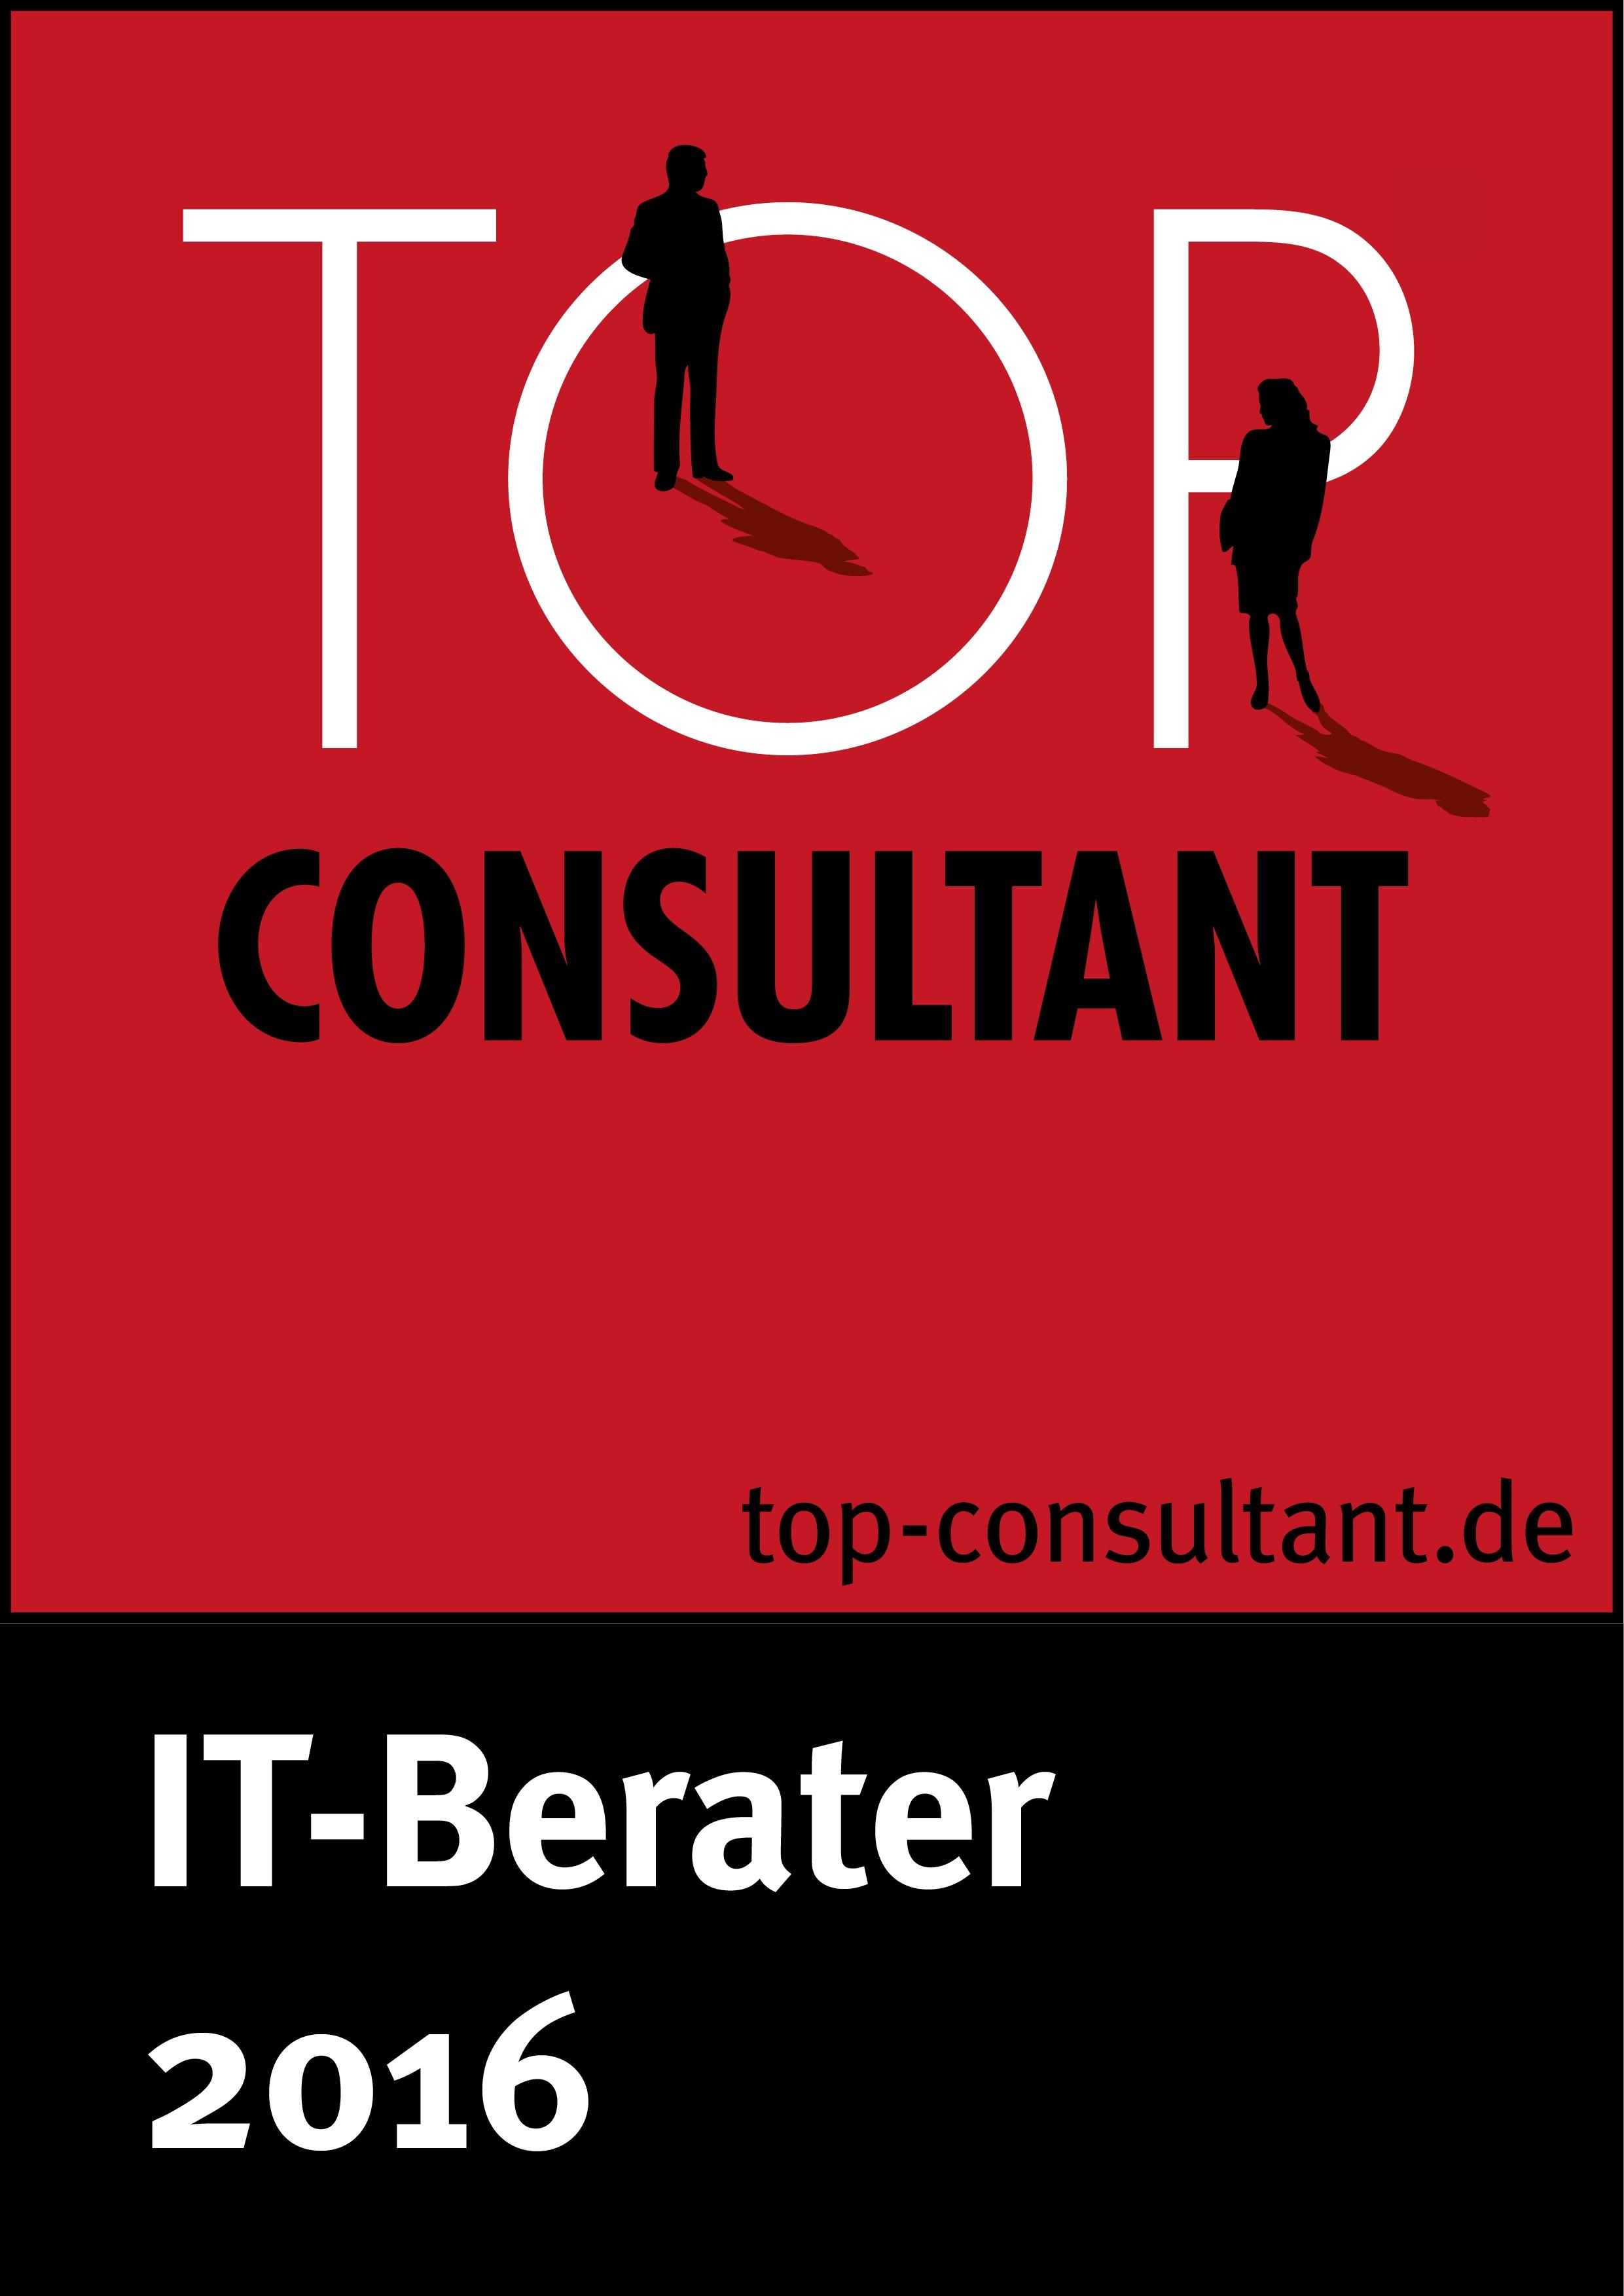 TC_16_Member_ITB_URL_rgb (2).jpg